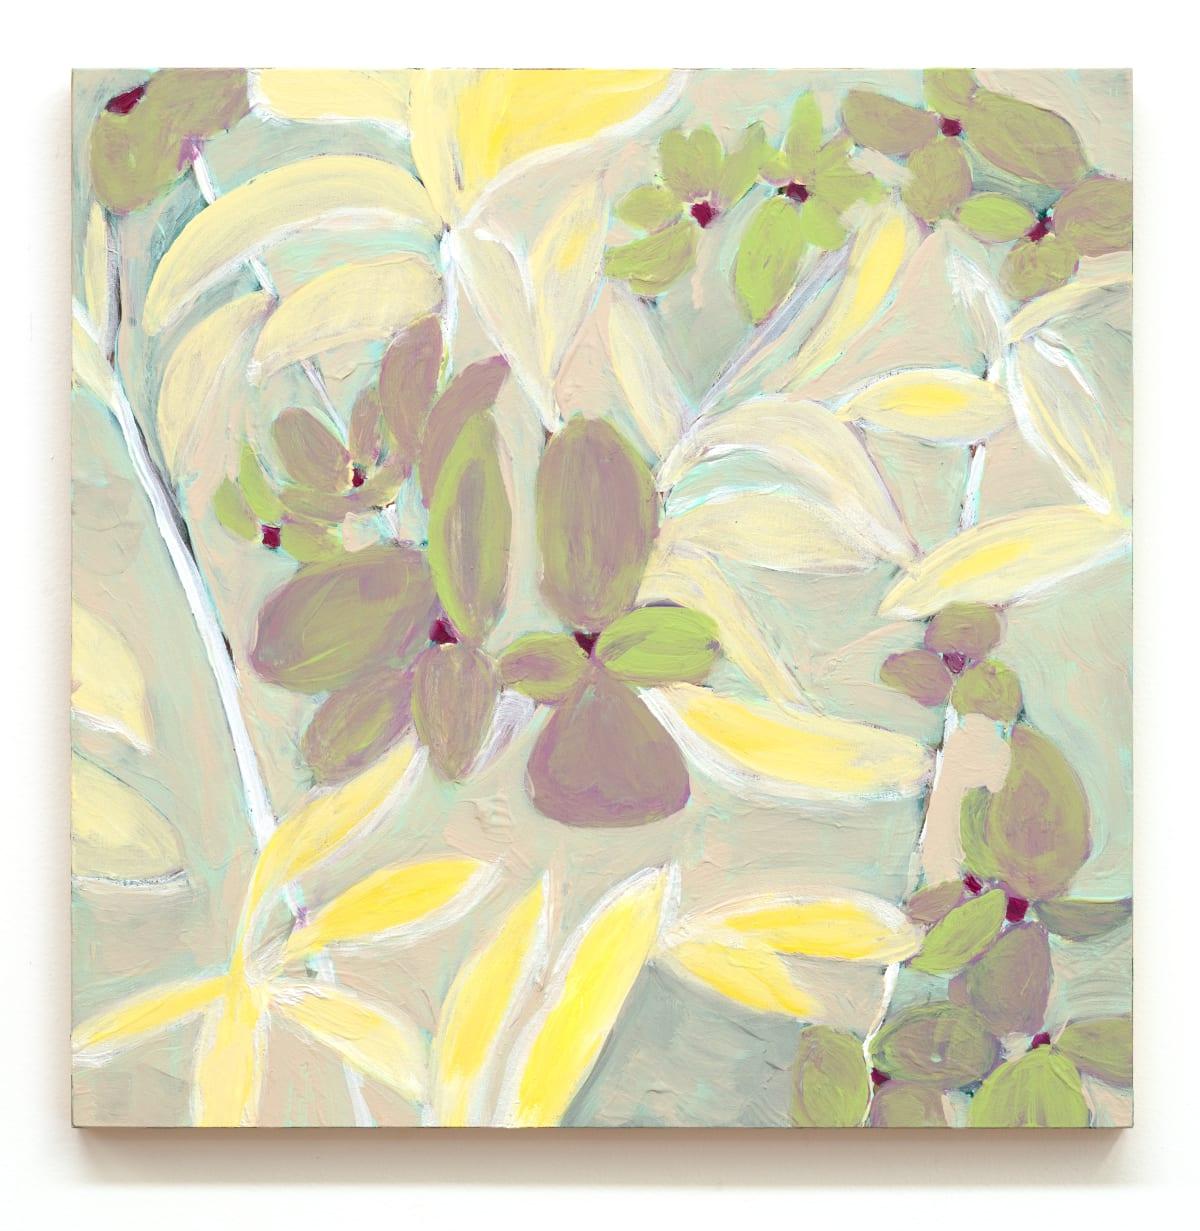 Negin Dastgheib, Marshmallow Bloom, 2020